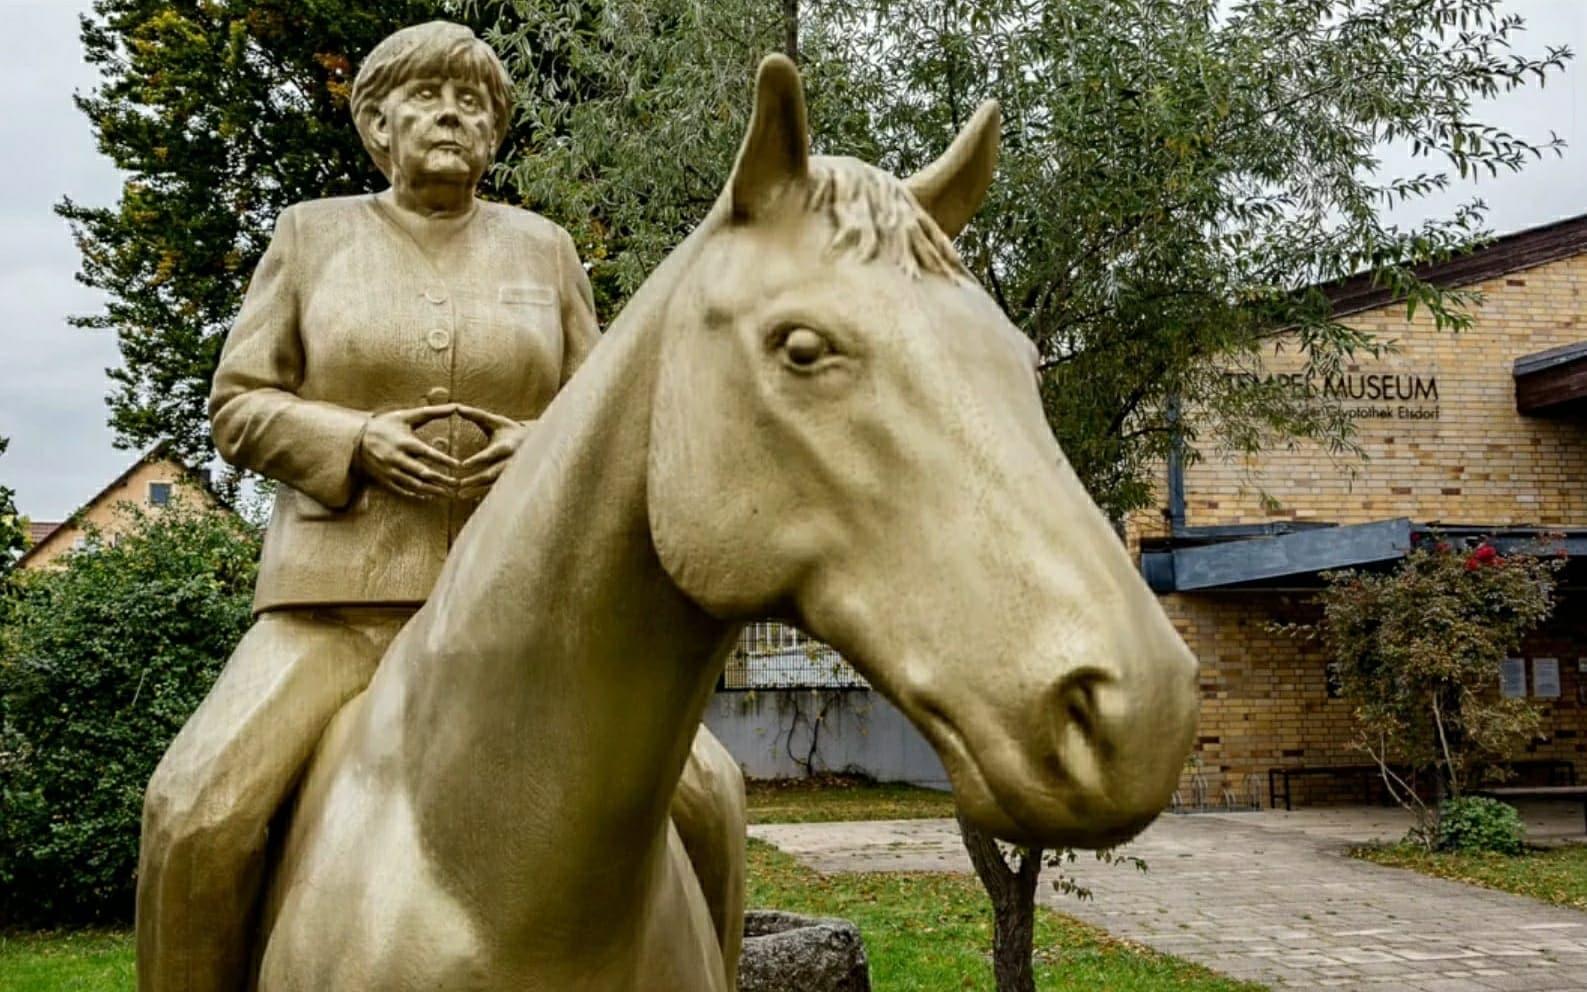 La statua equestre di Angela Merkel